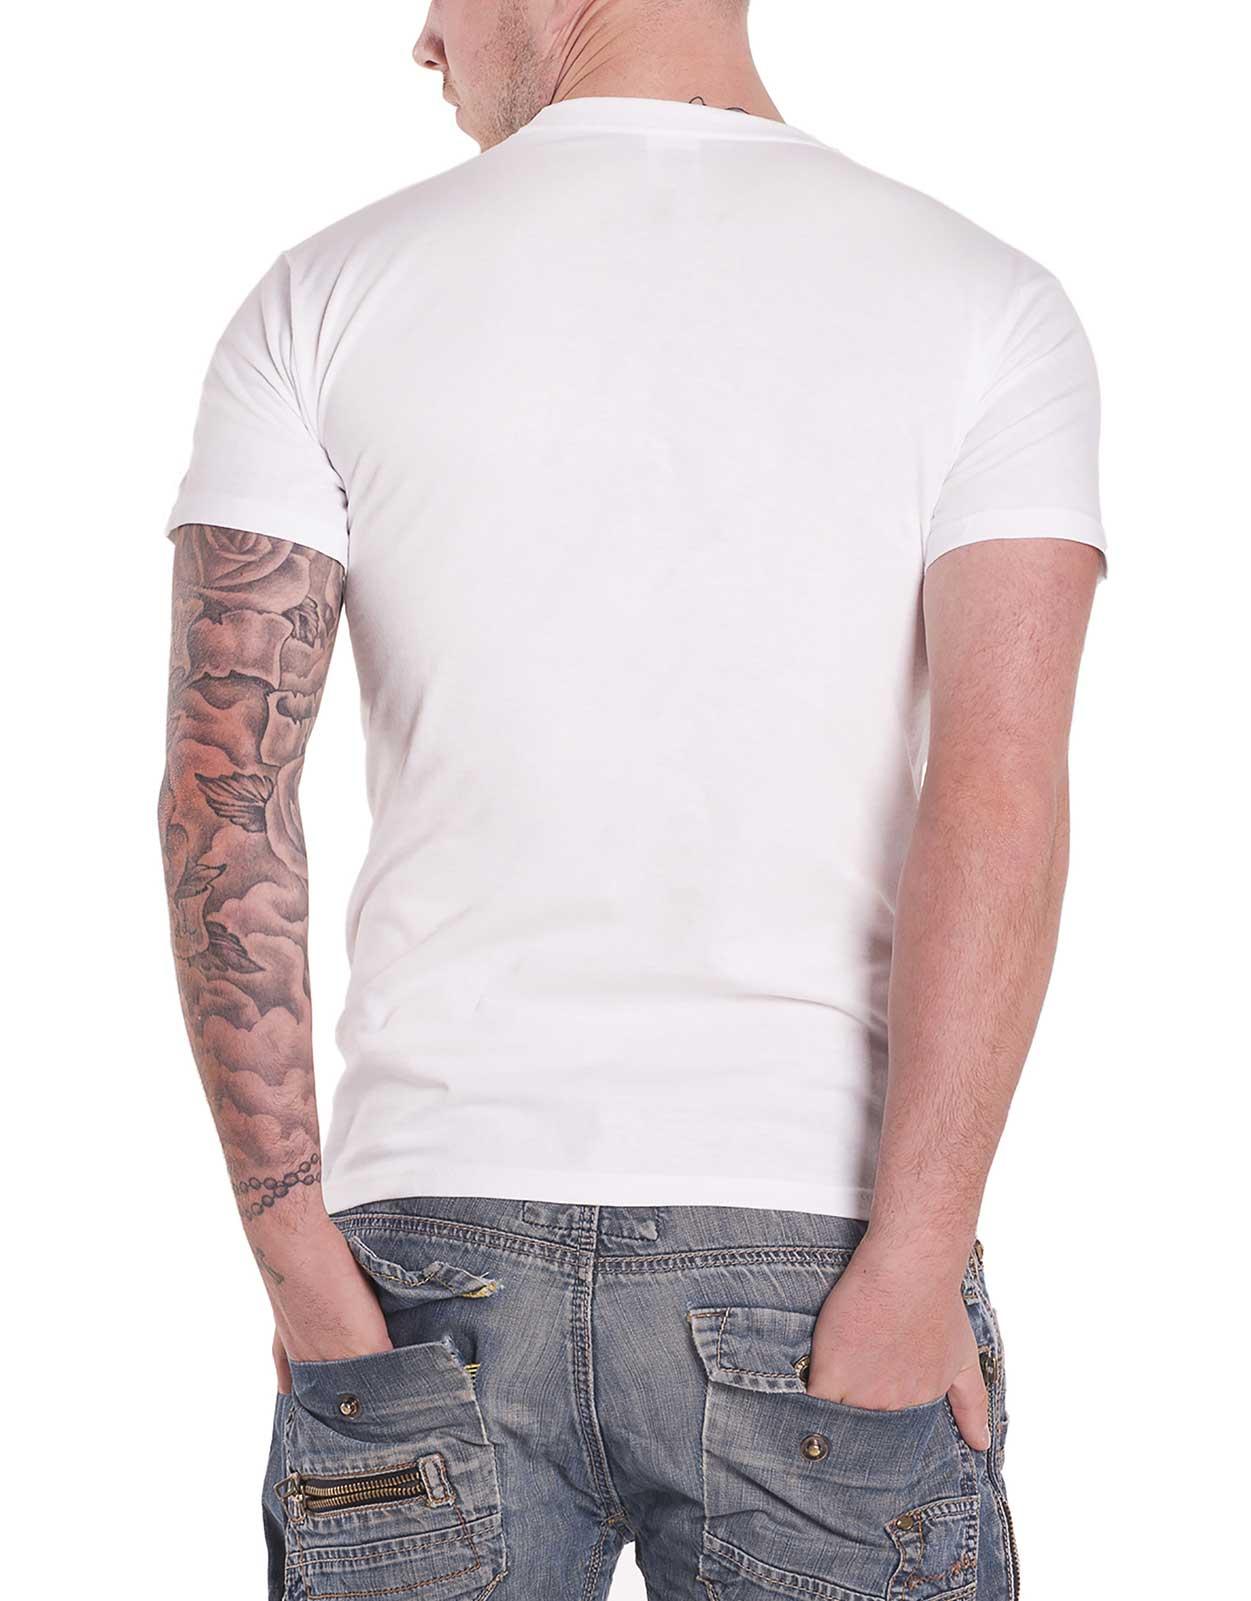 Official-Motley-Crue-T-Shirt-Shout-at-the-Devil-The-Dirt-Tour-Band-Logo-Mens thumbnail 50